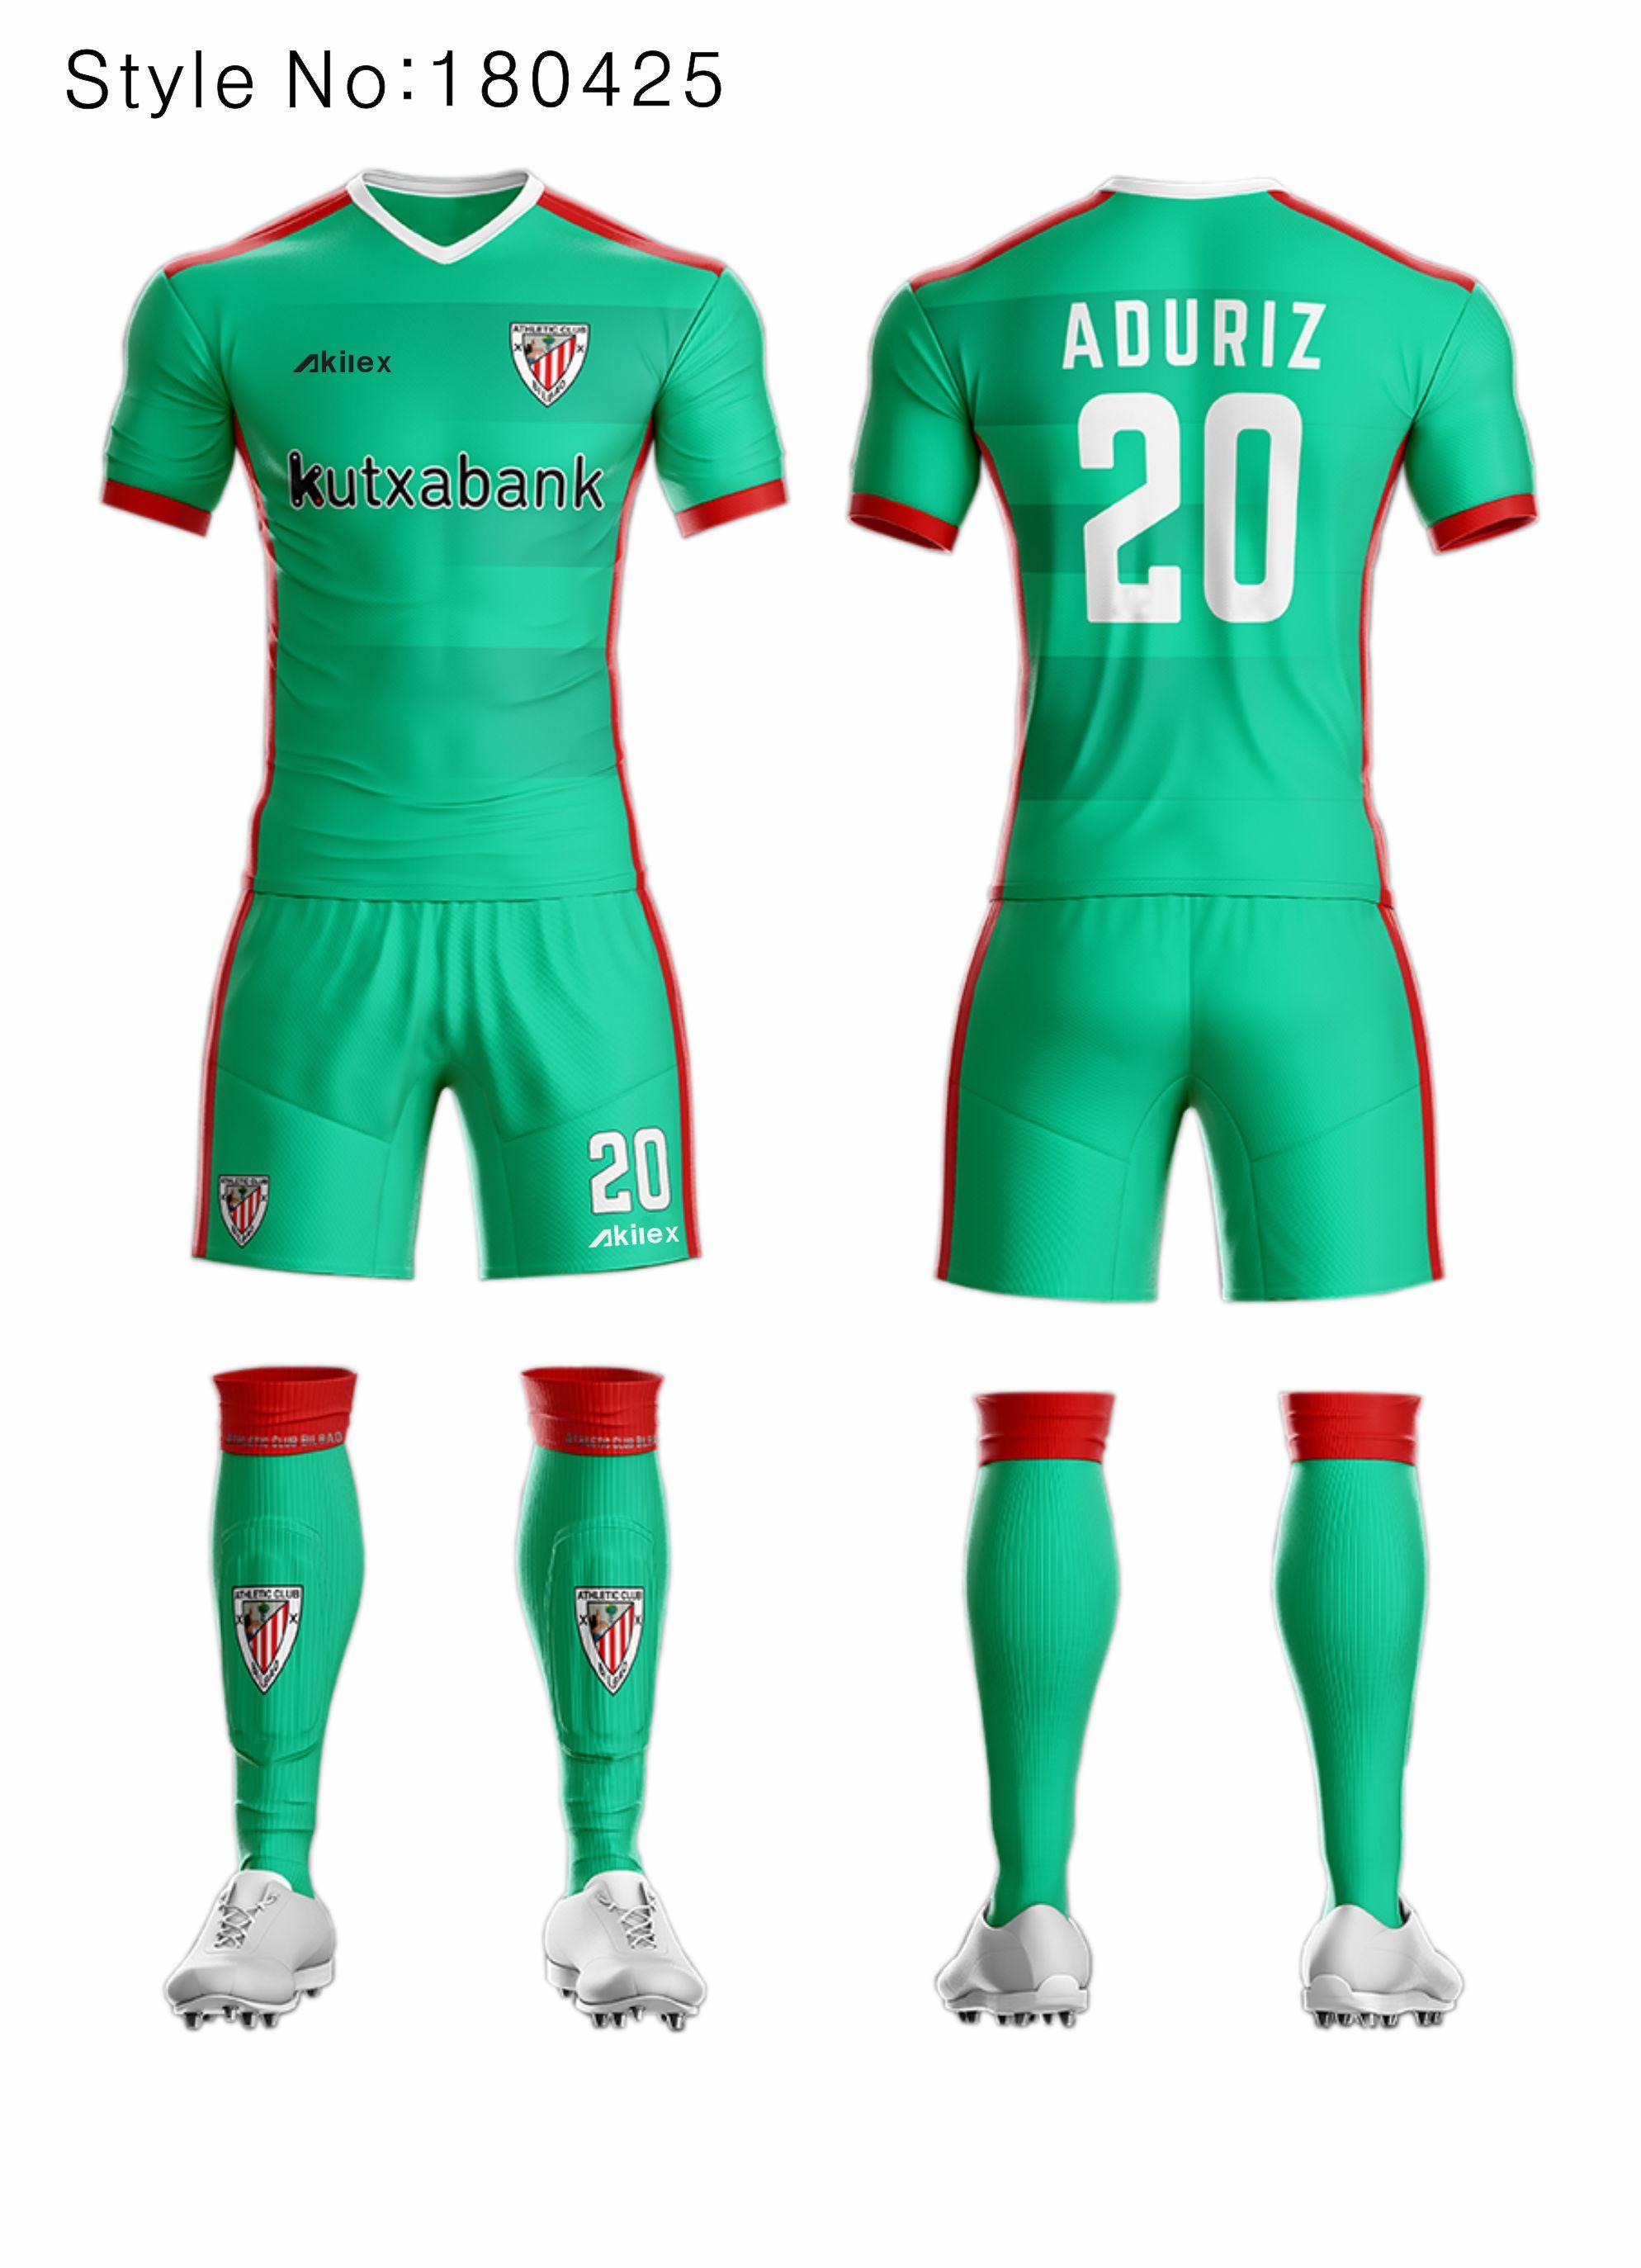 Soccer Team Shirts Cheap Joe Maloy